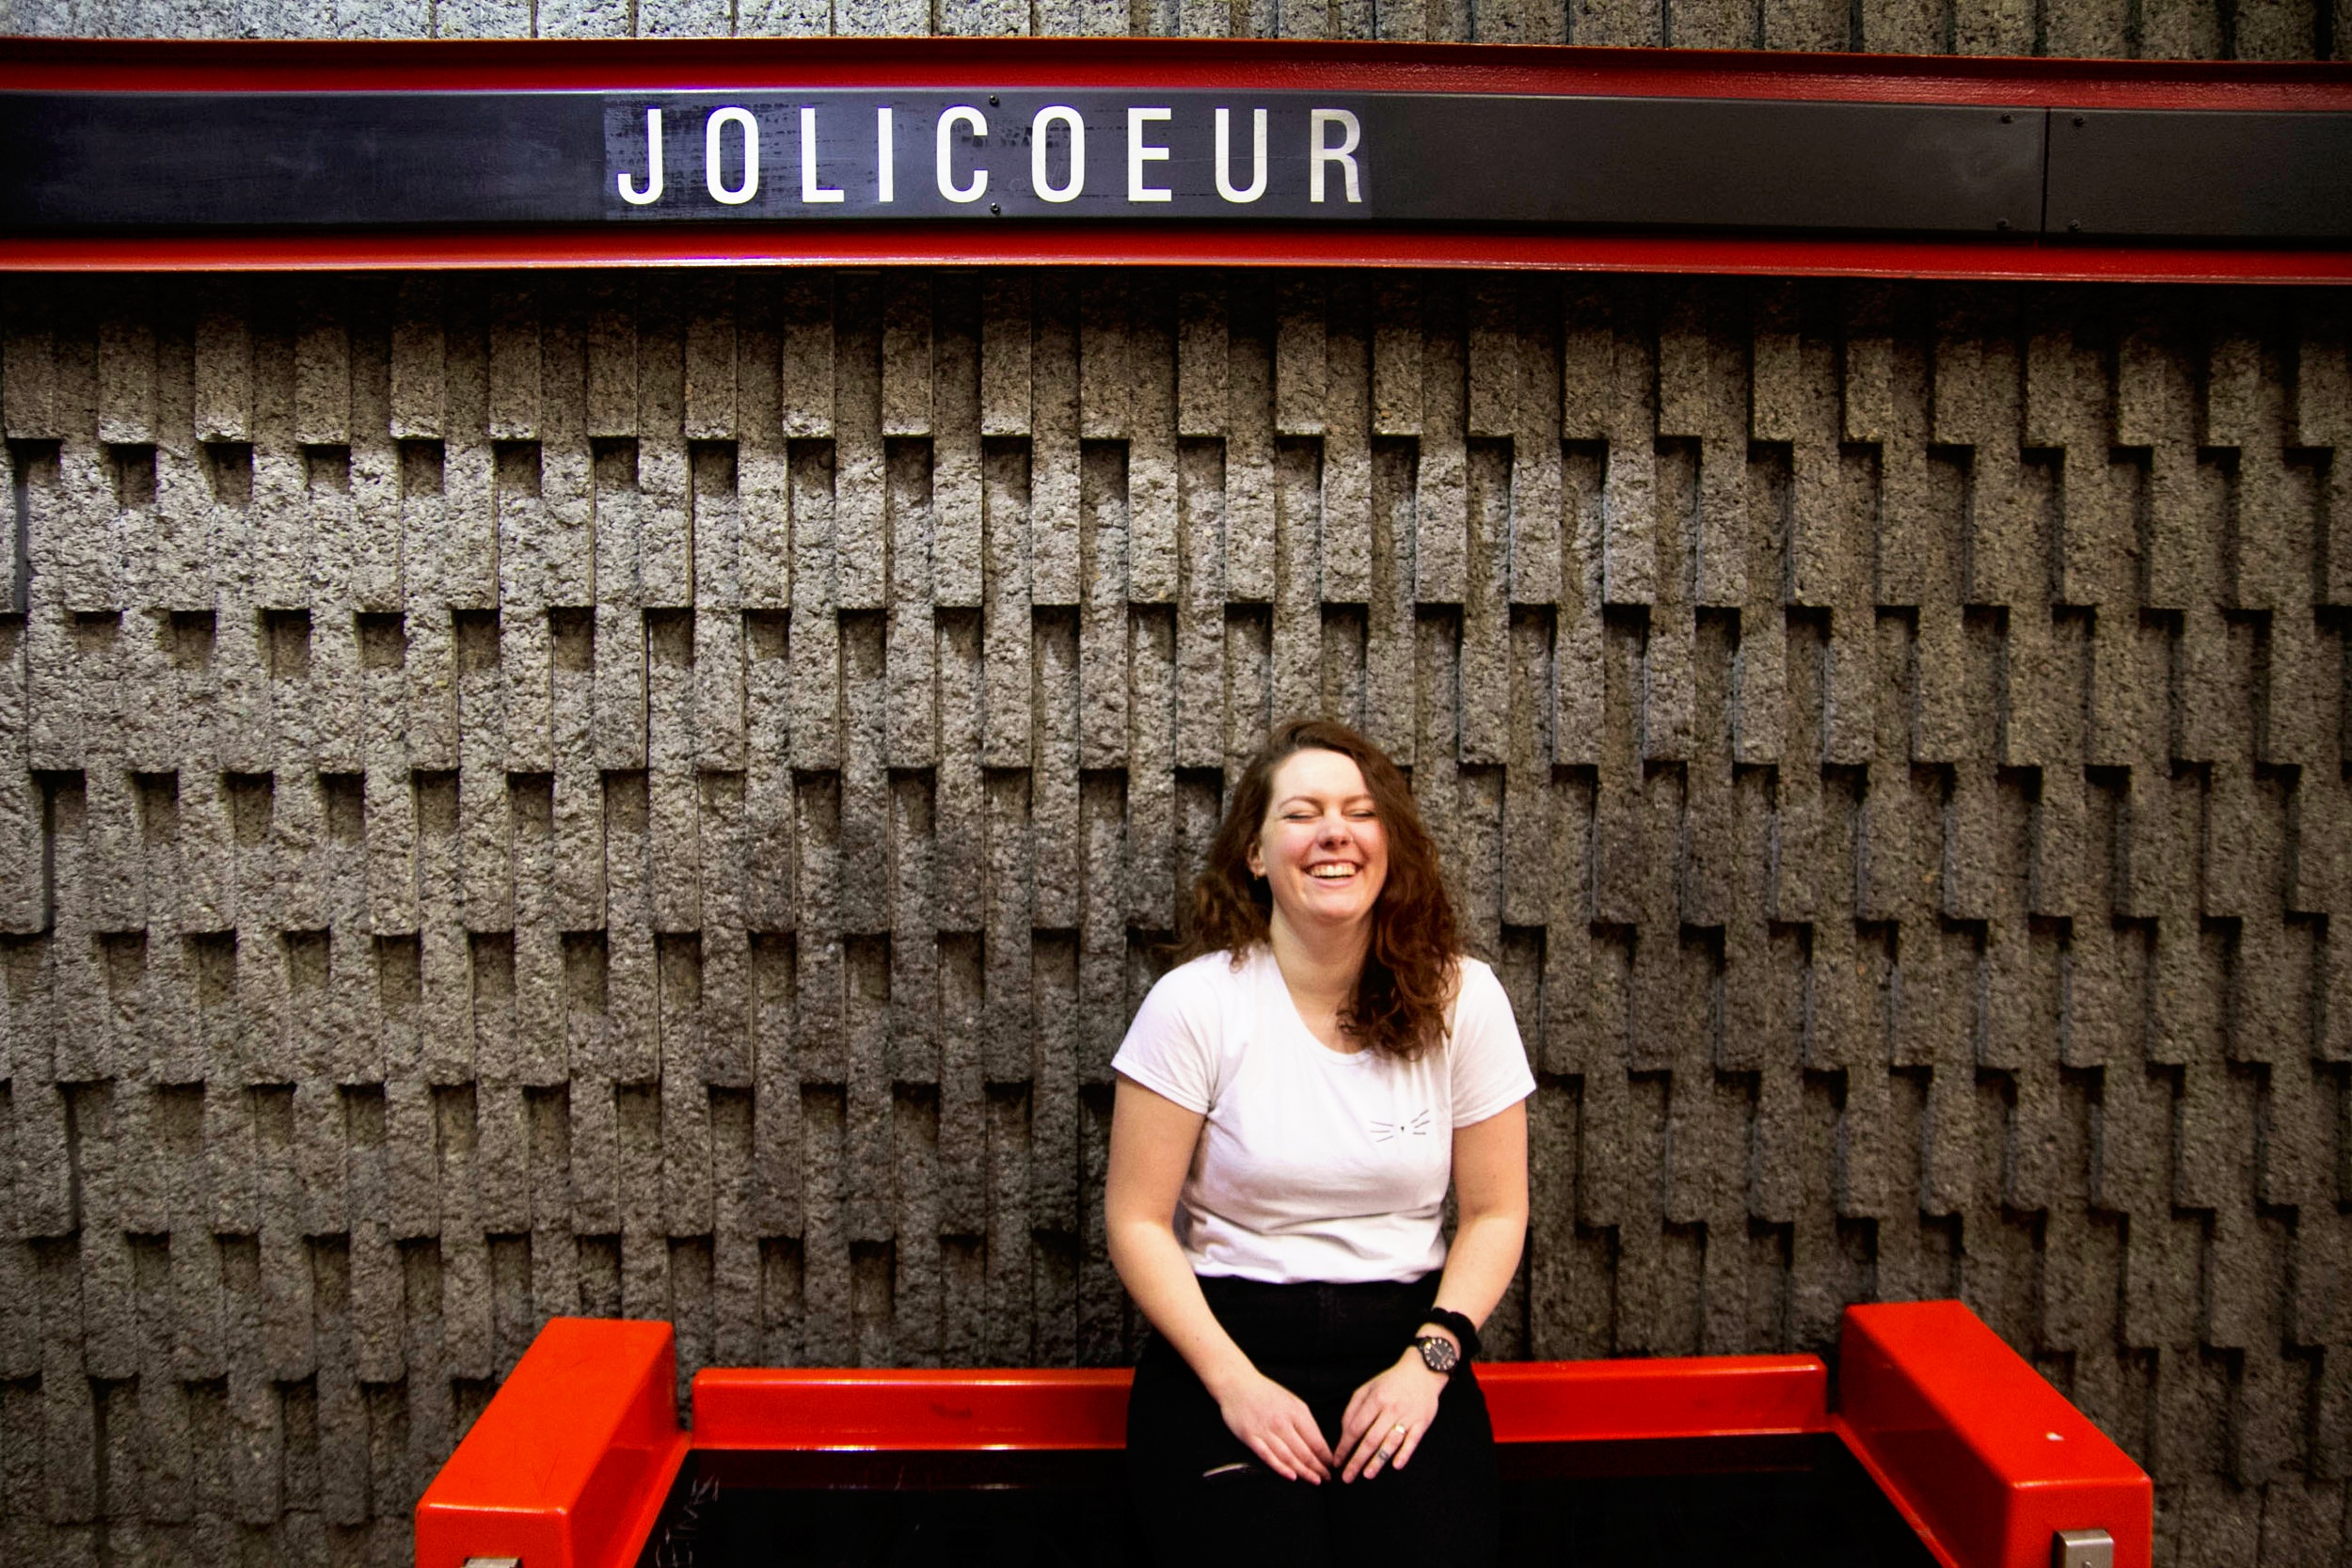 Lola+laughing+in+the+metro